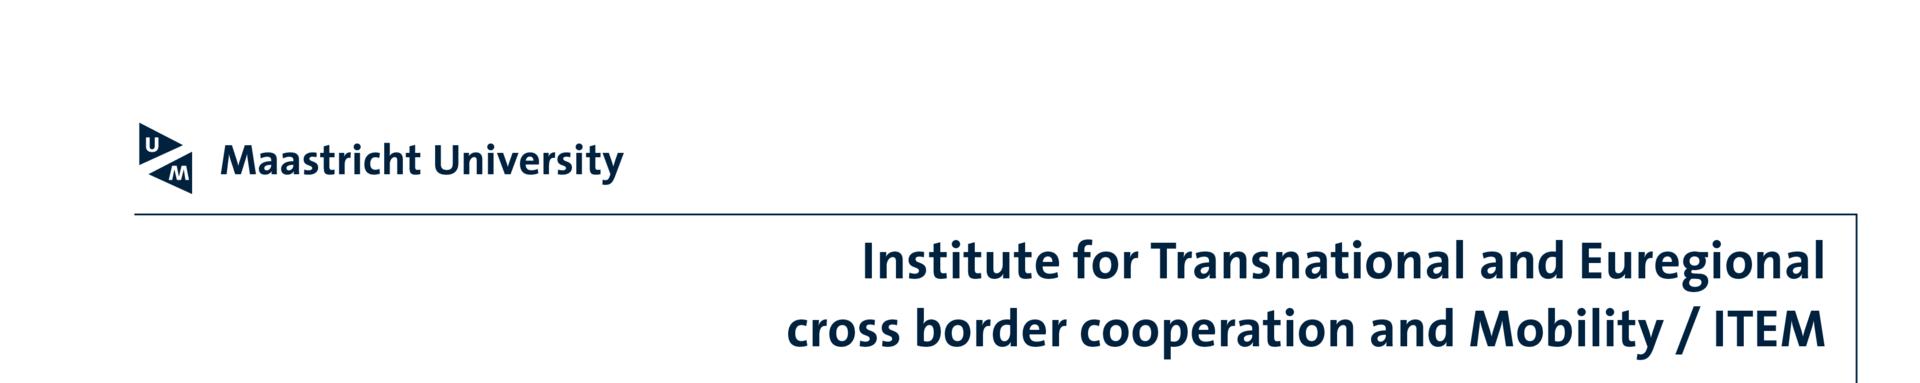 ITEM Expertmeeting Verordening sociale zekerheid - Voorbereidende vergadering